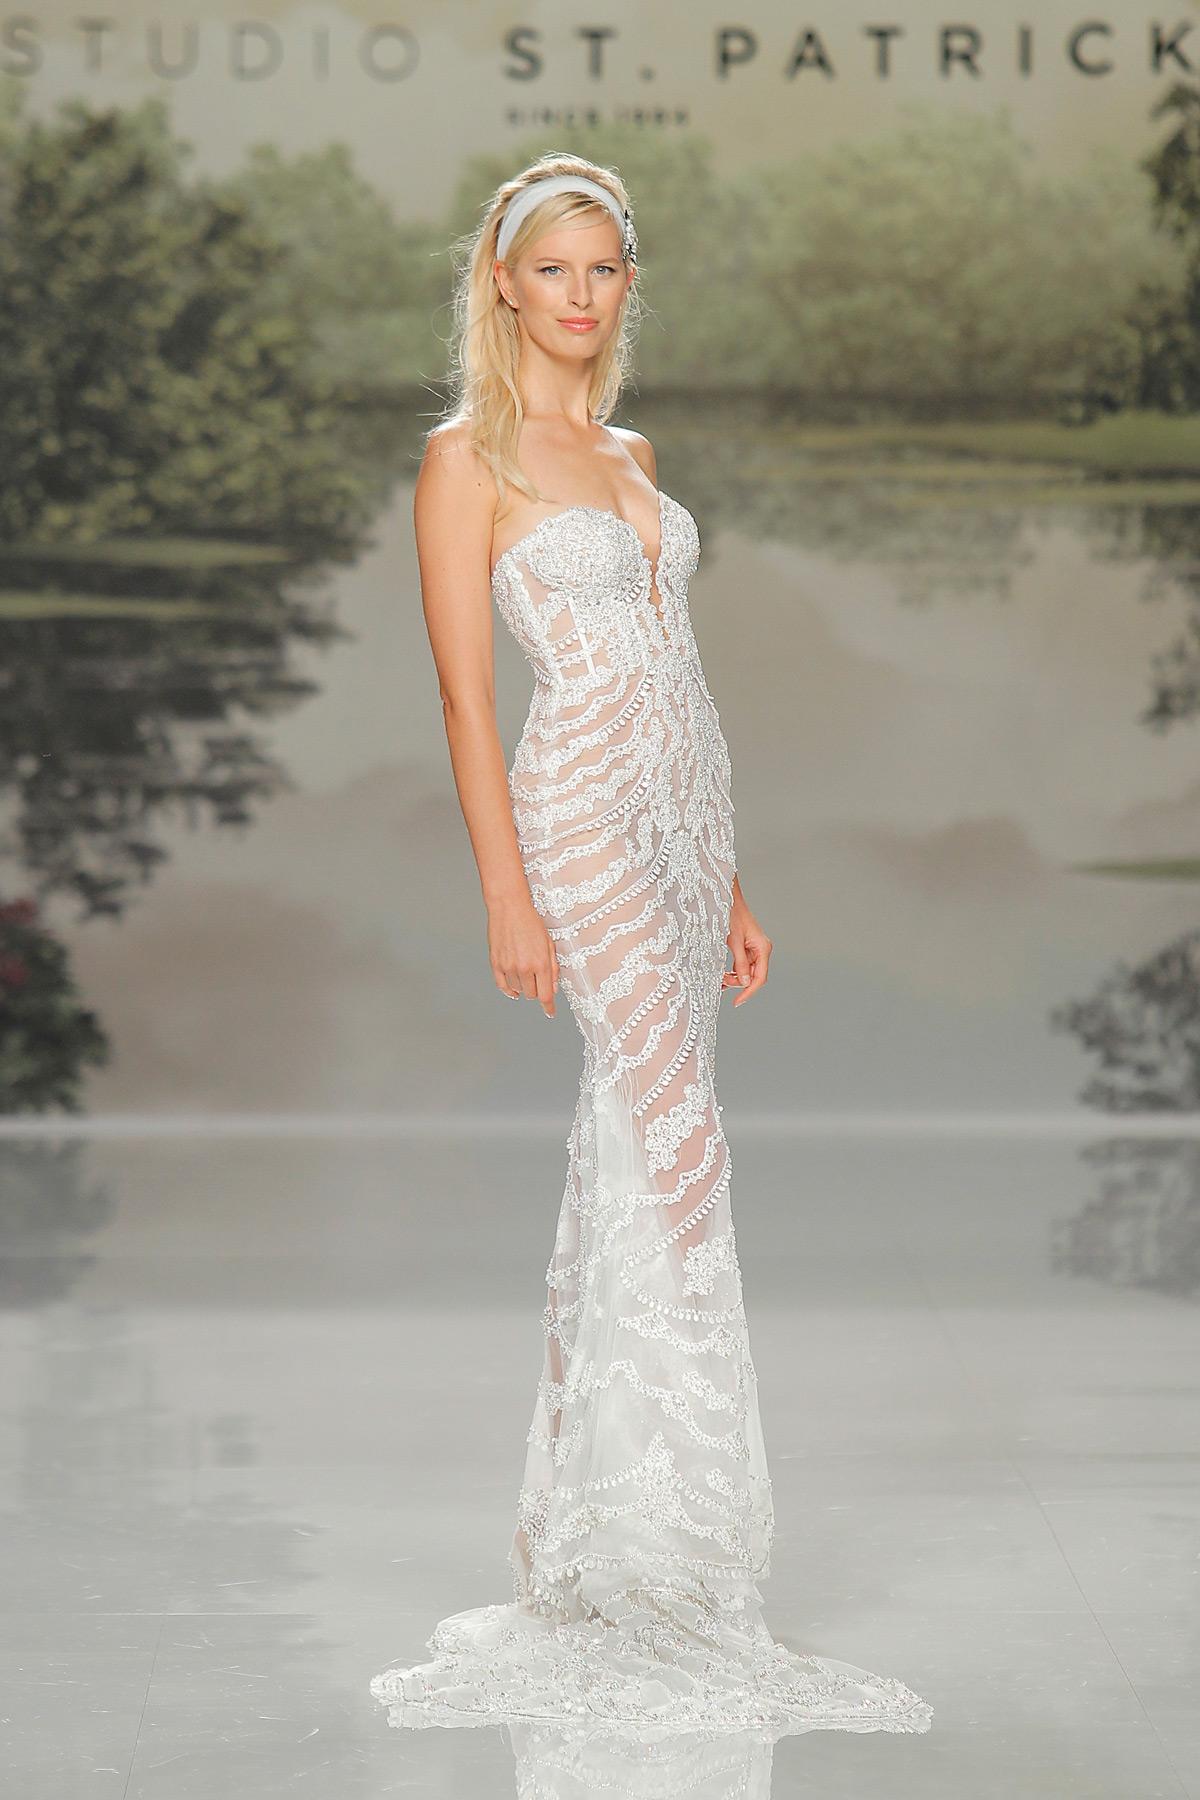 bfa183e71e Introducing Studio St. Patrick, by Pronovias | Love My Dress® UK ...